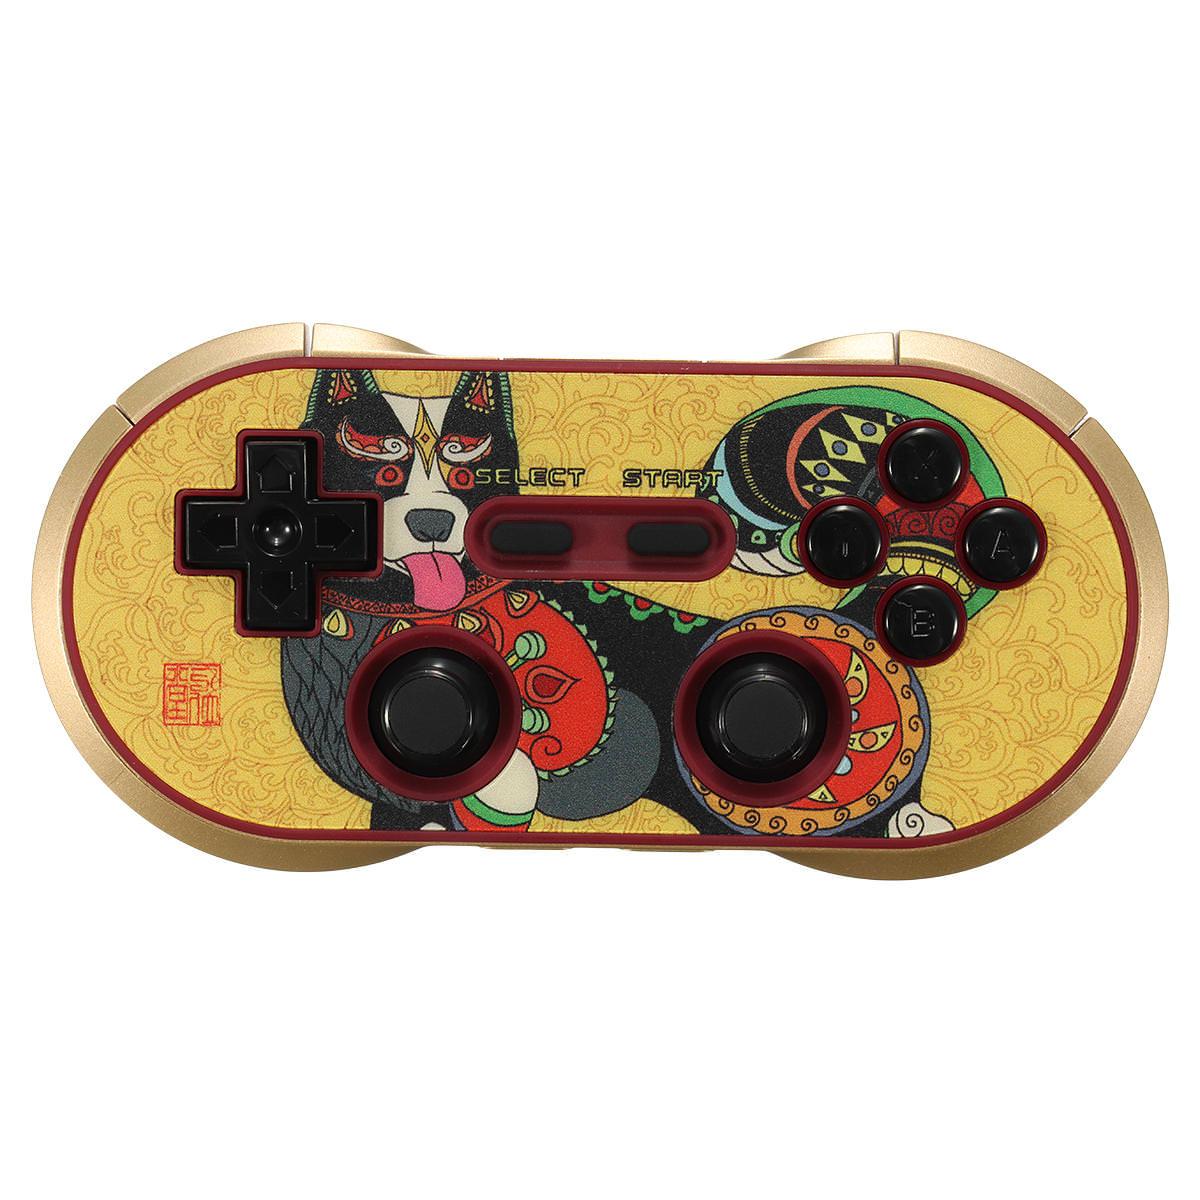 8bitdo fc30 pro wireless game controller